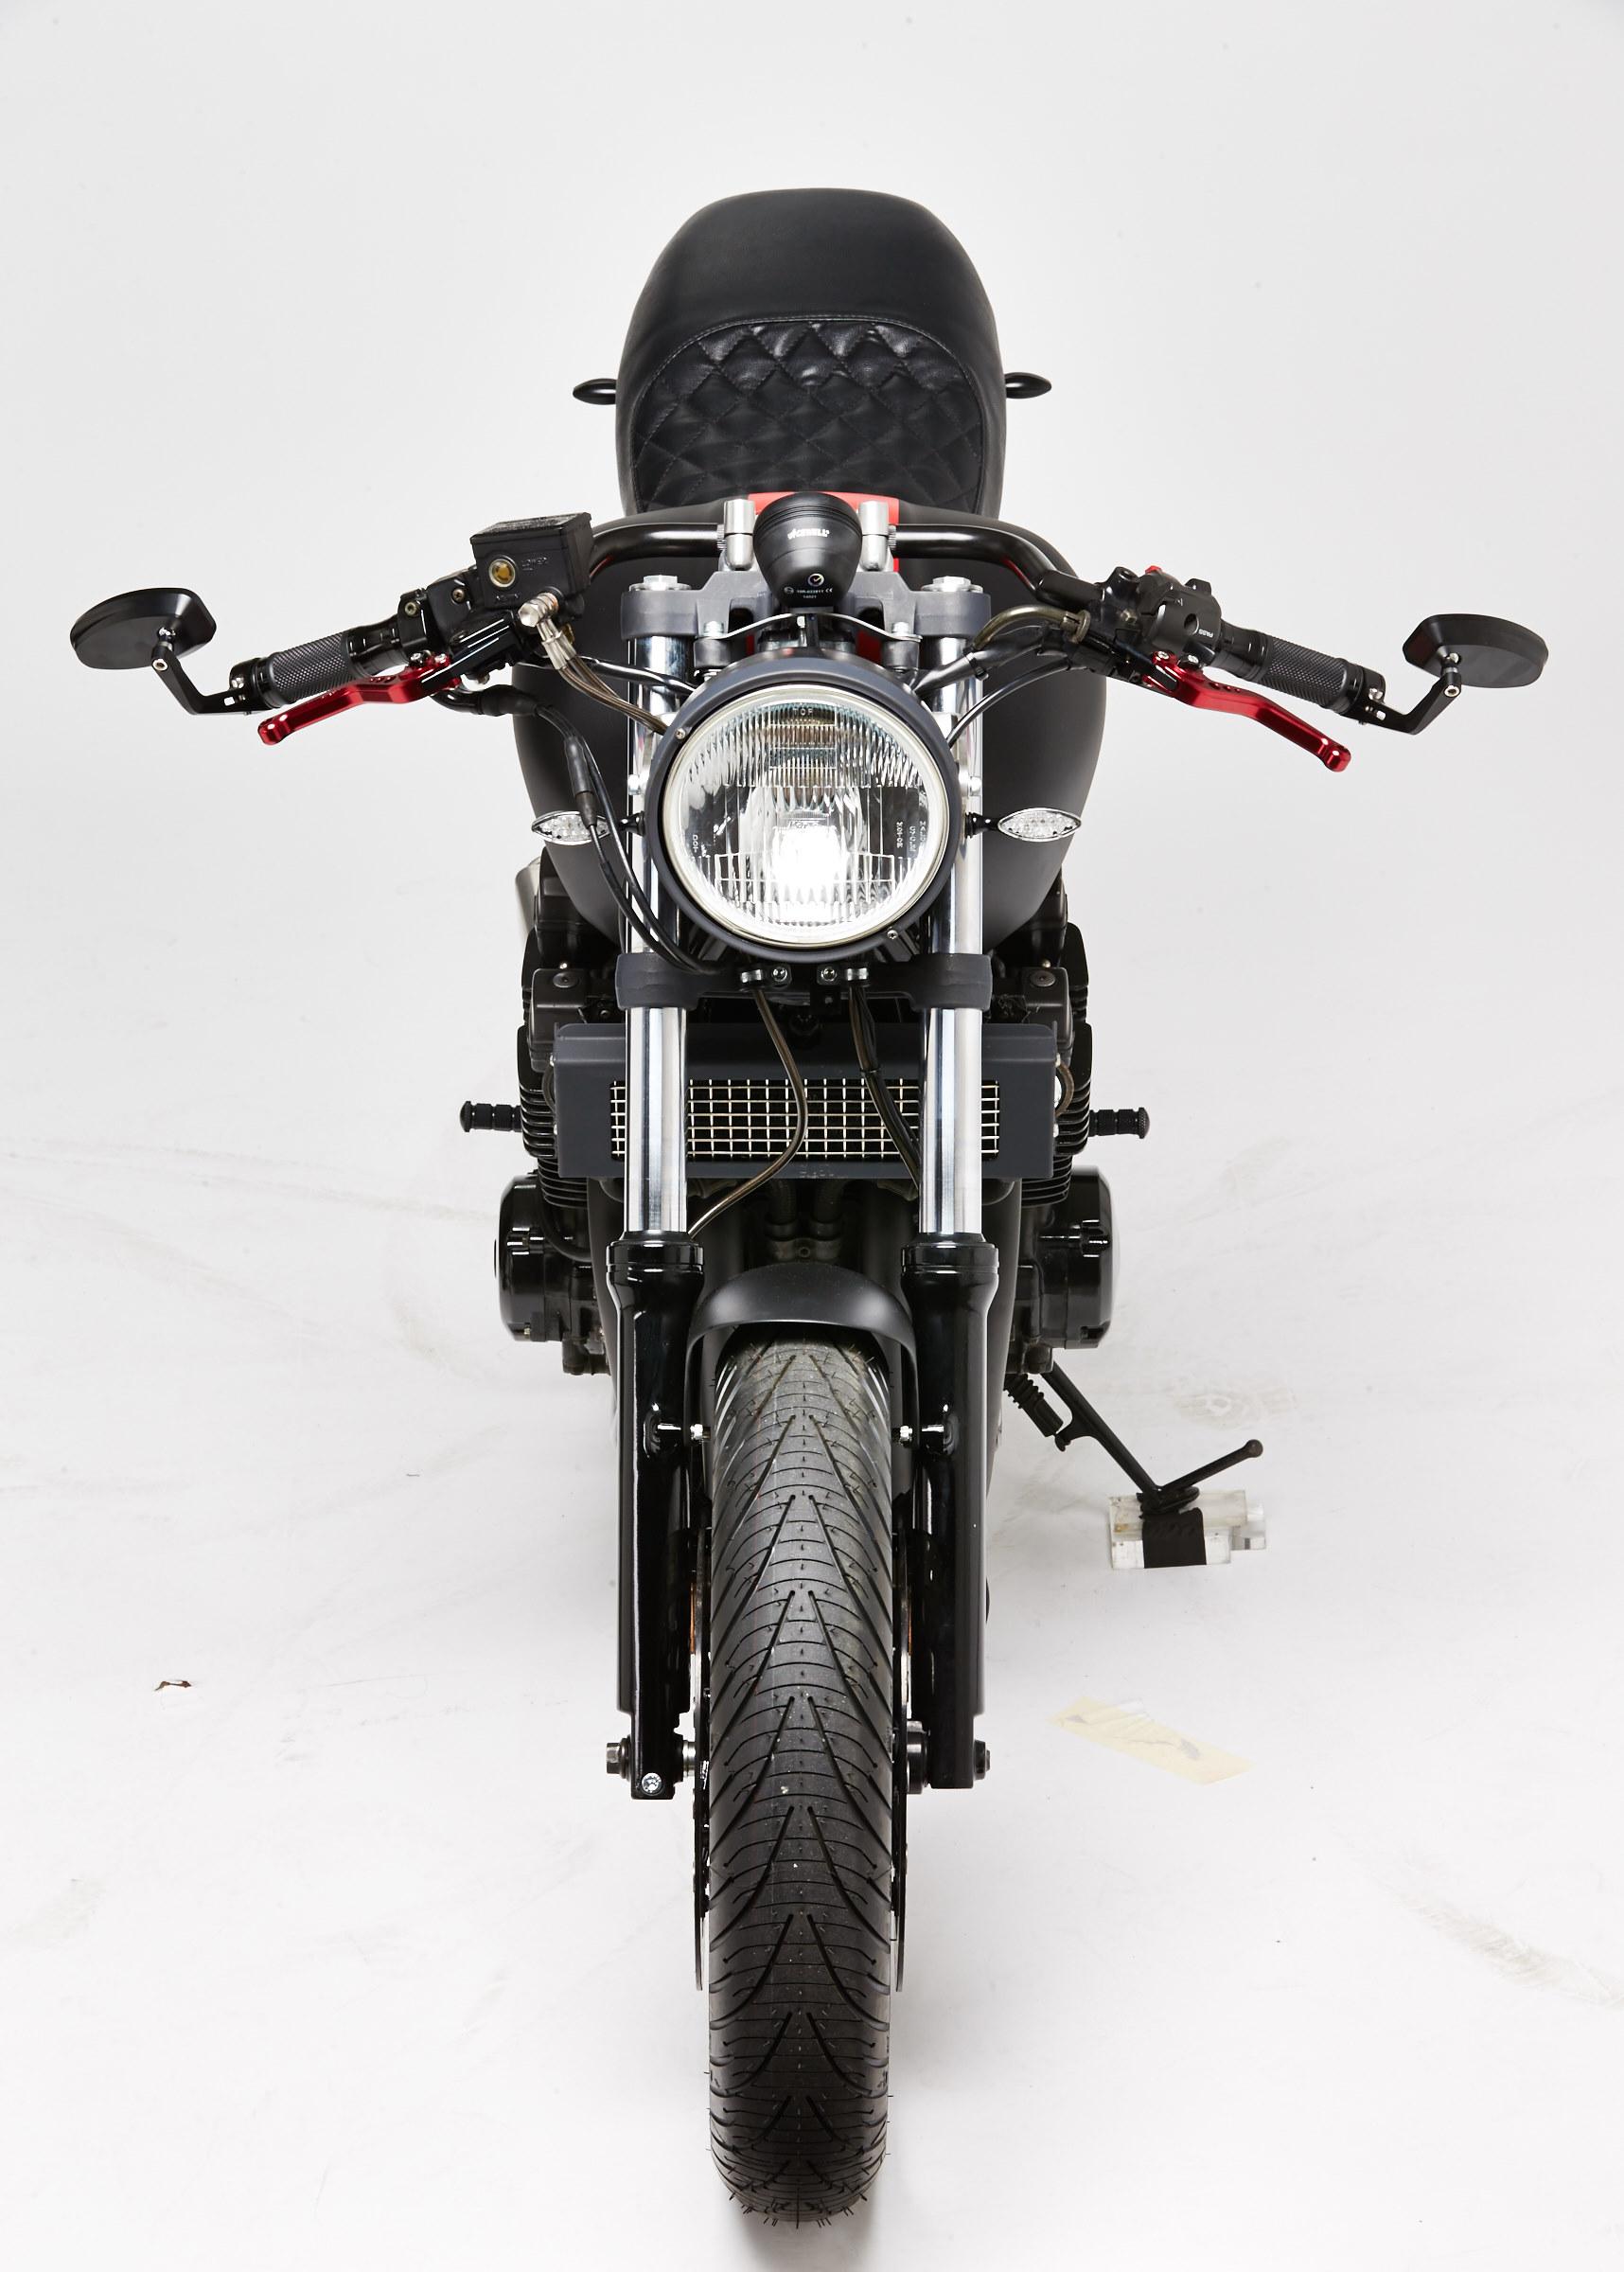 Custom Bikes Mid Life Cycles